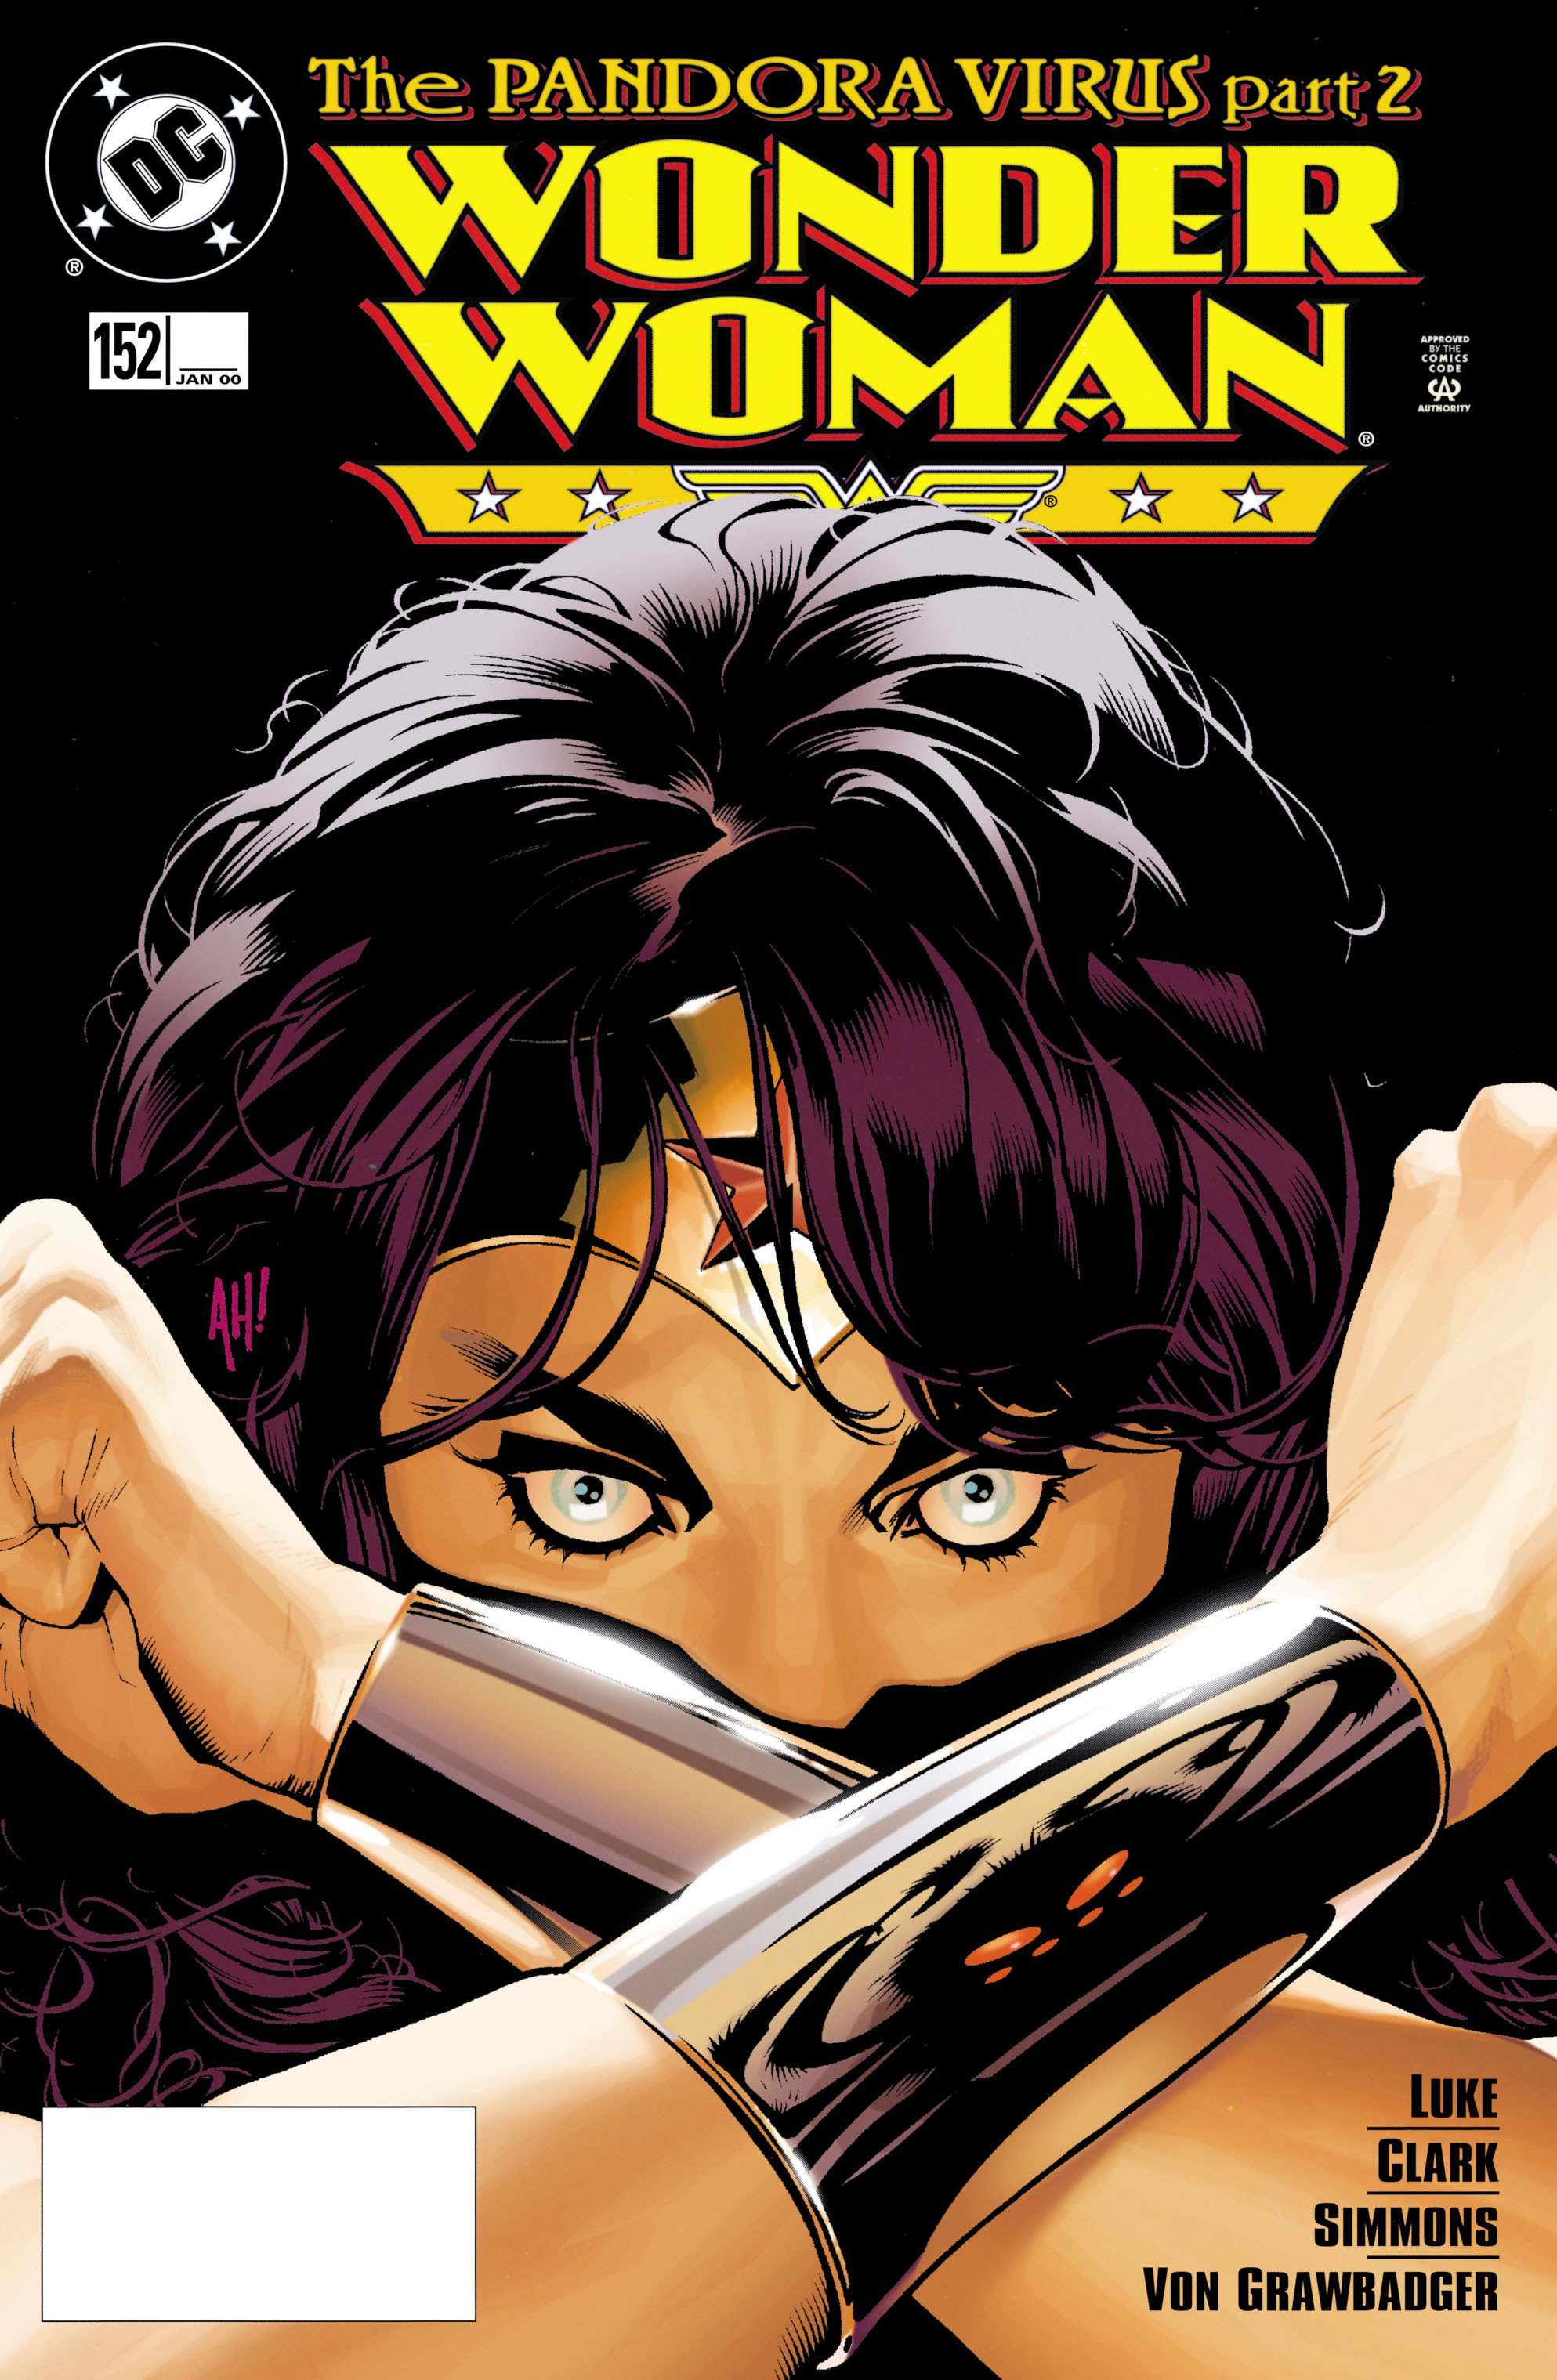 Read online Wonder Woman (1987) comic -  Issue #152 - 1